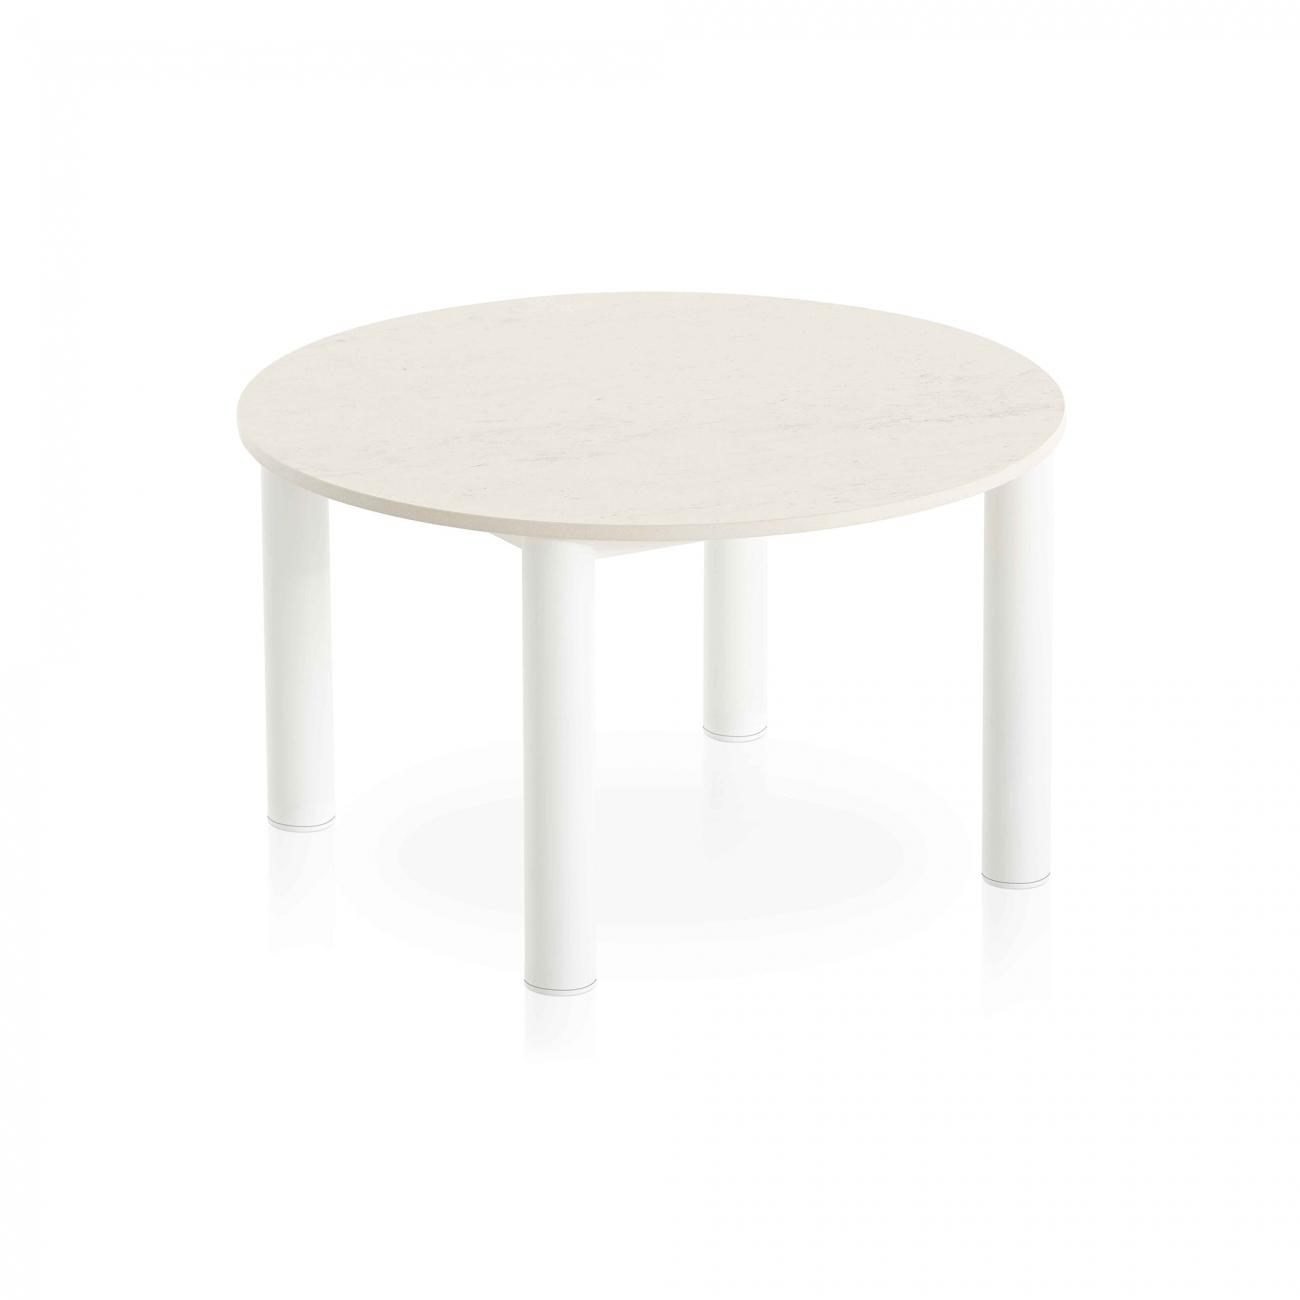 Gandia Blasco Bosc Round Coffee table